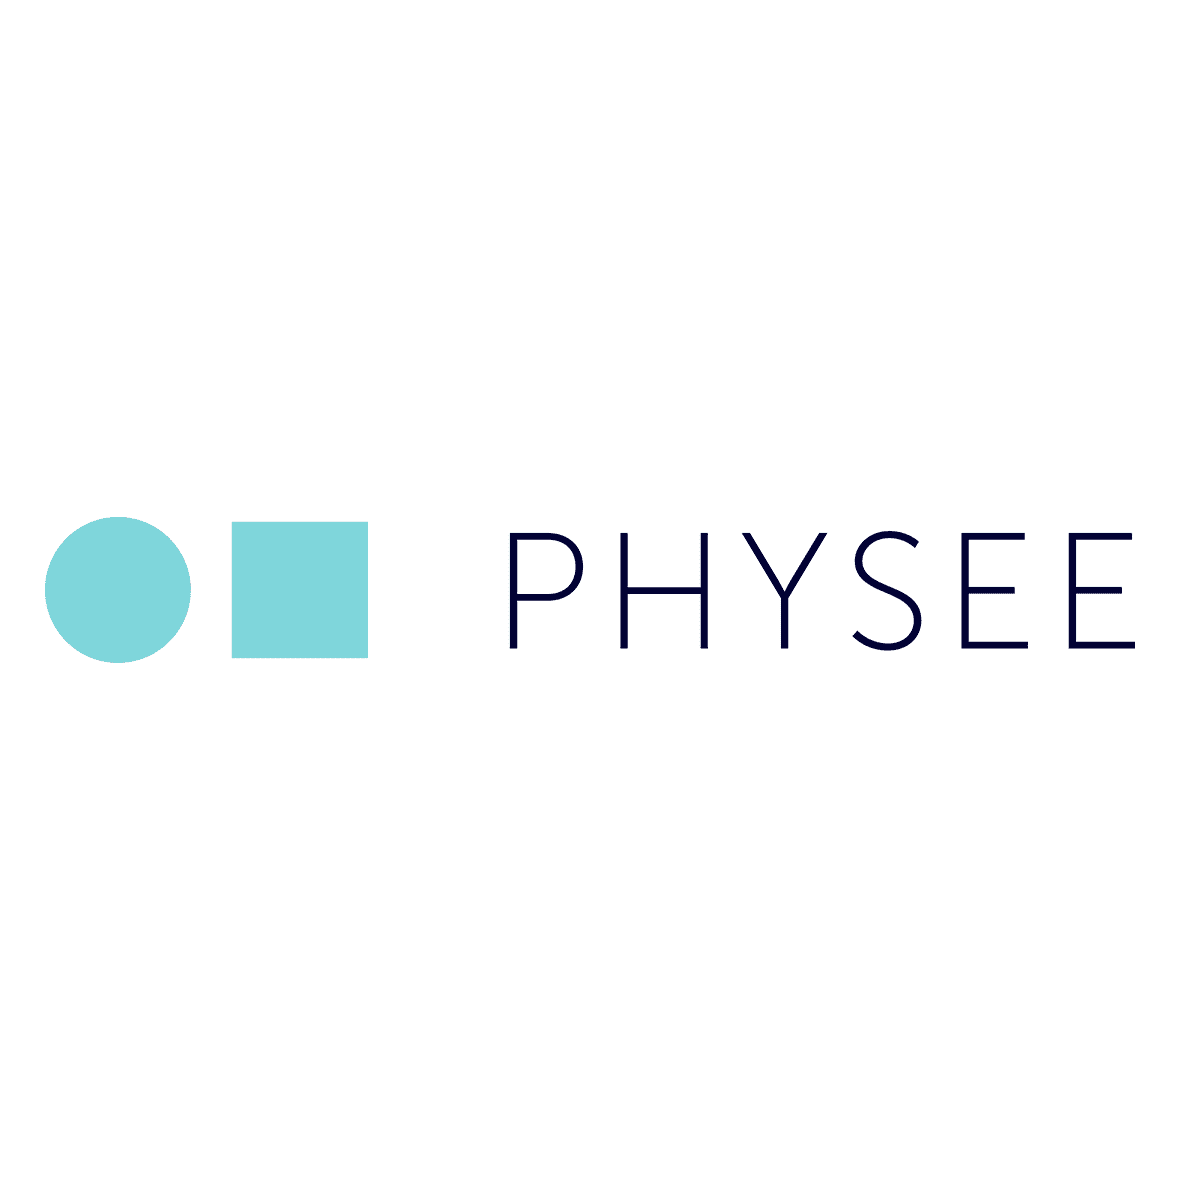 Physee's logo